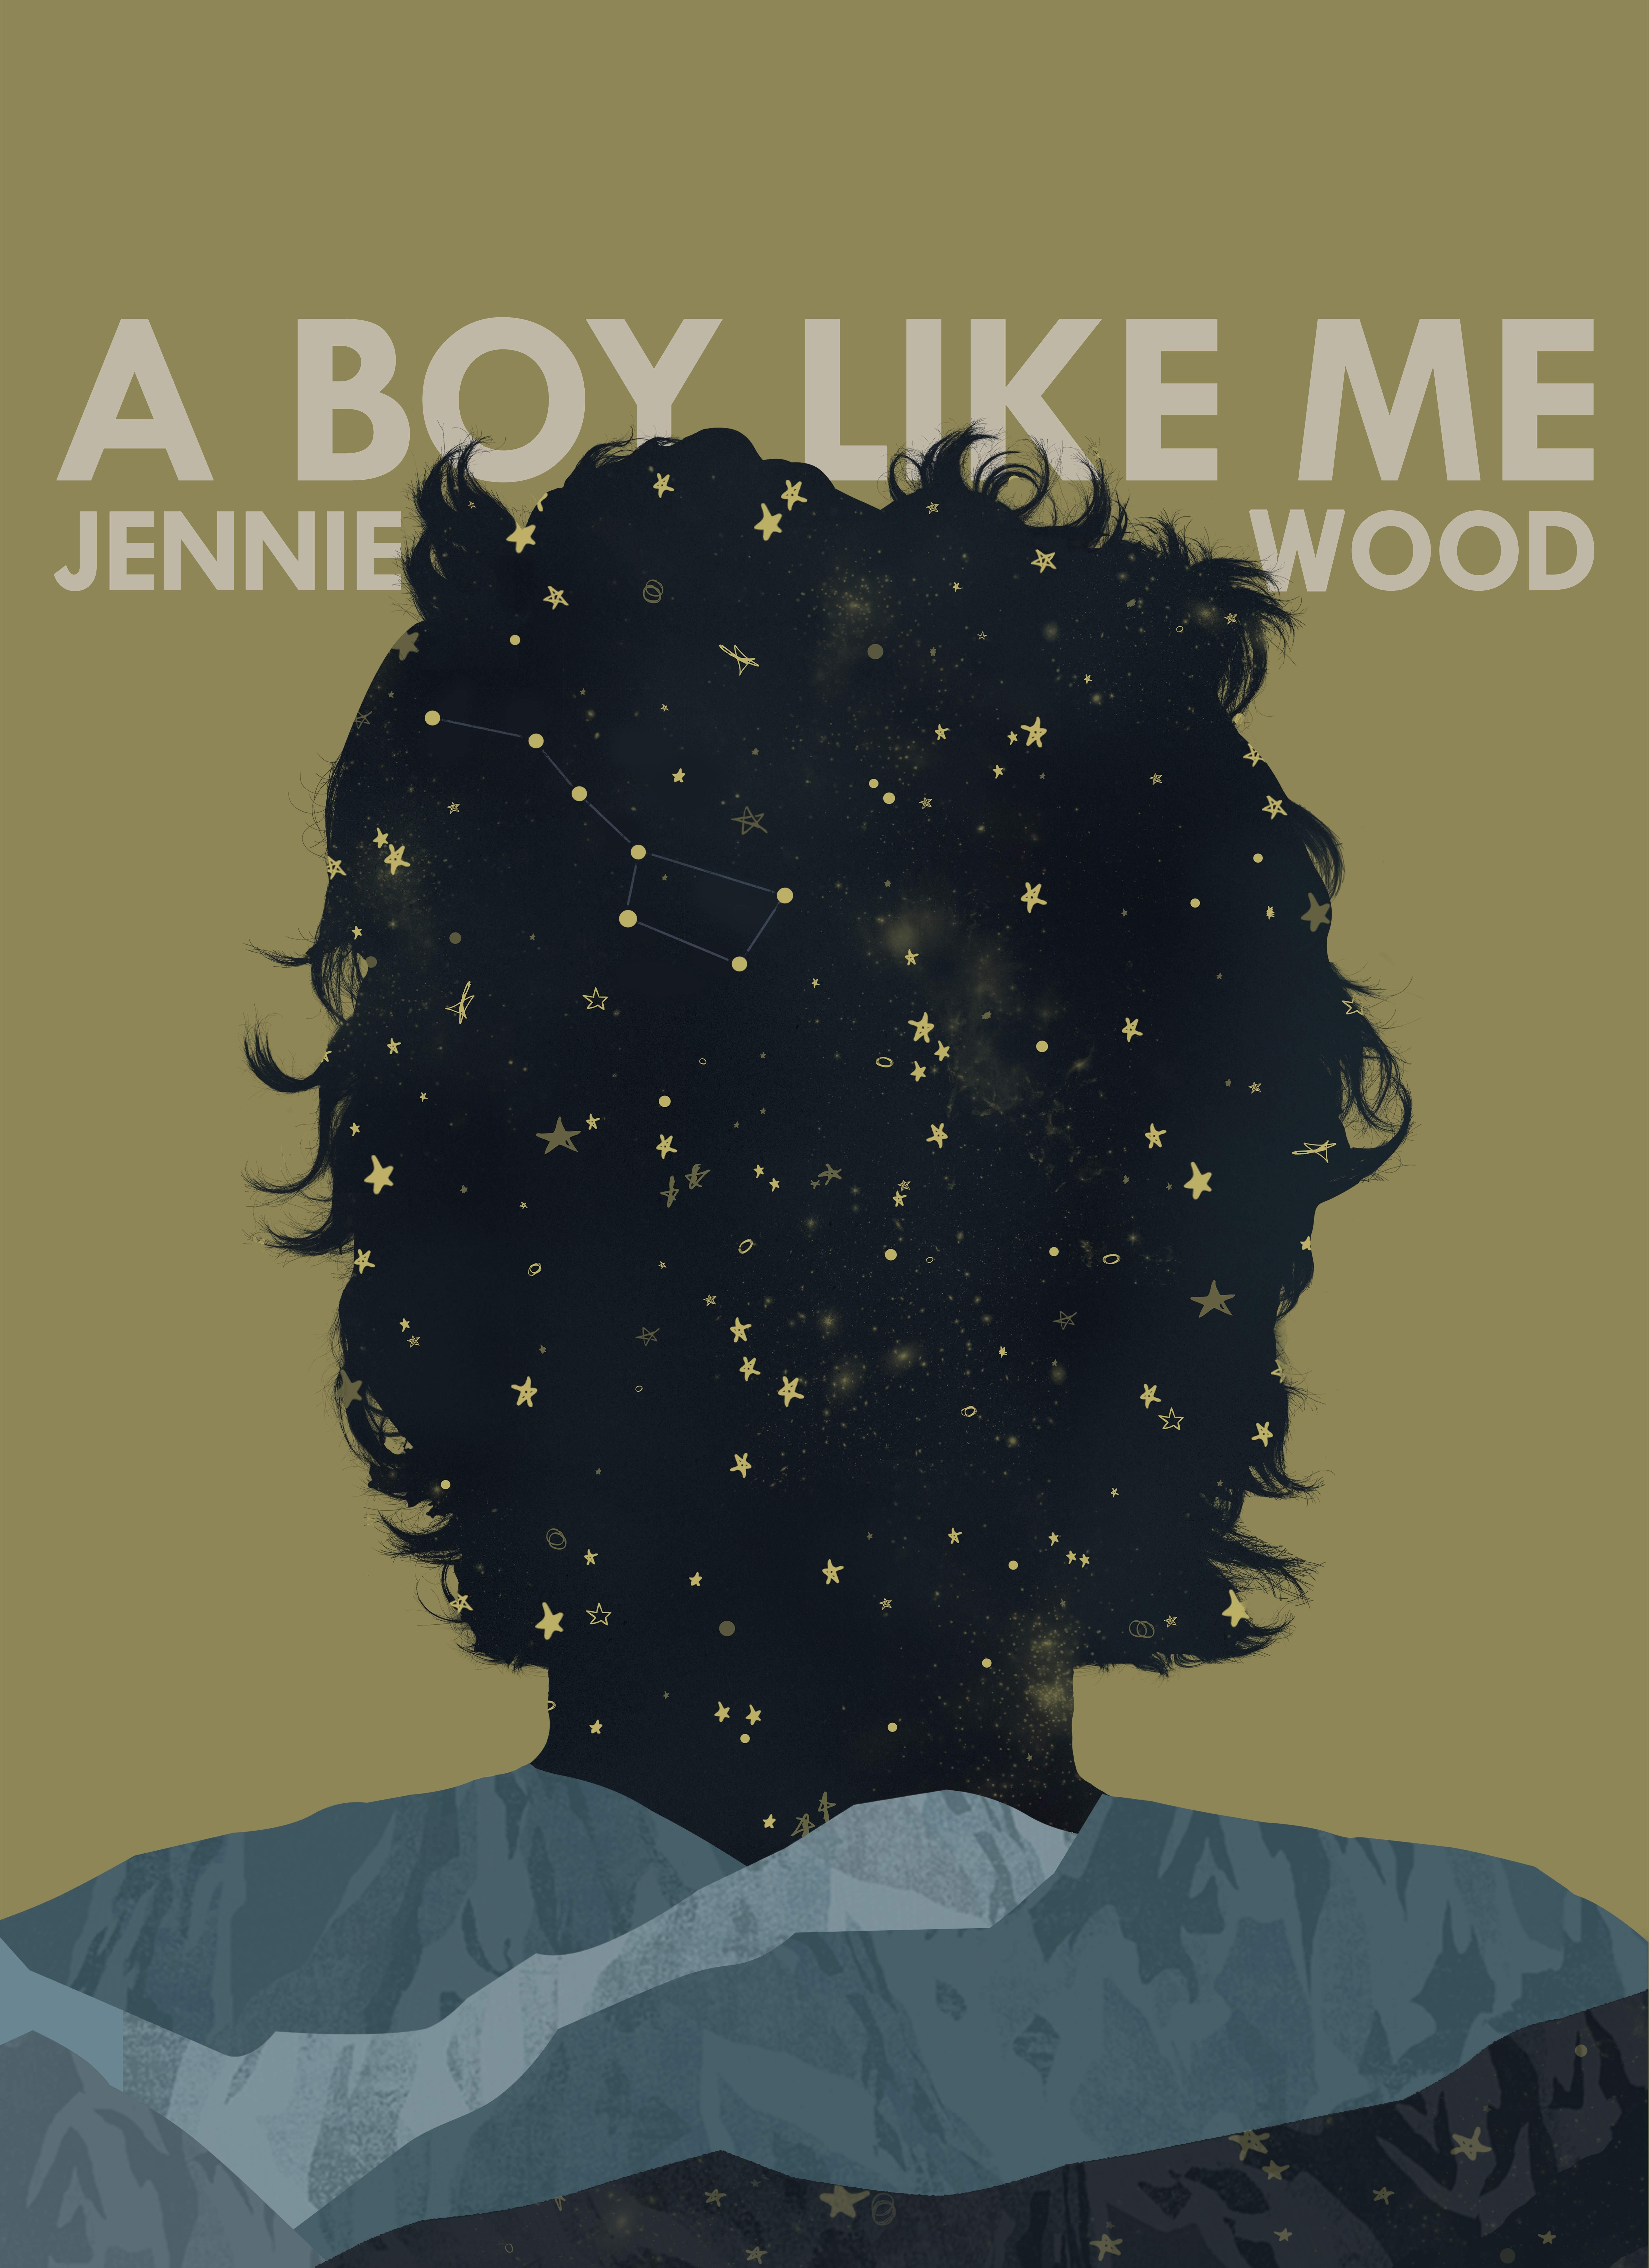 'A Boy Like Me' Dance Party